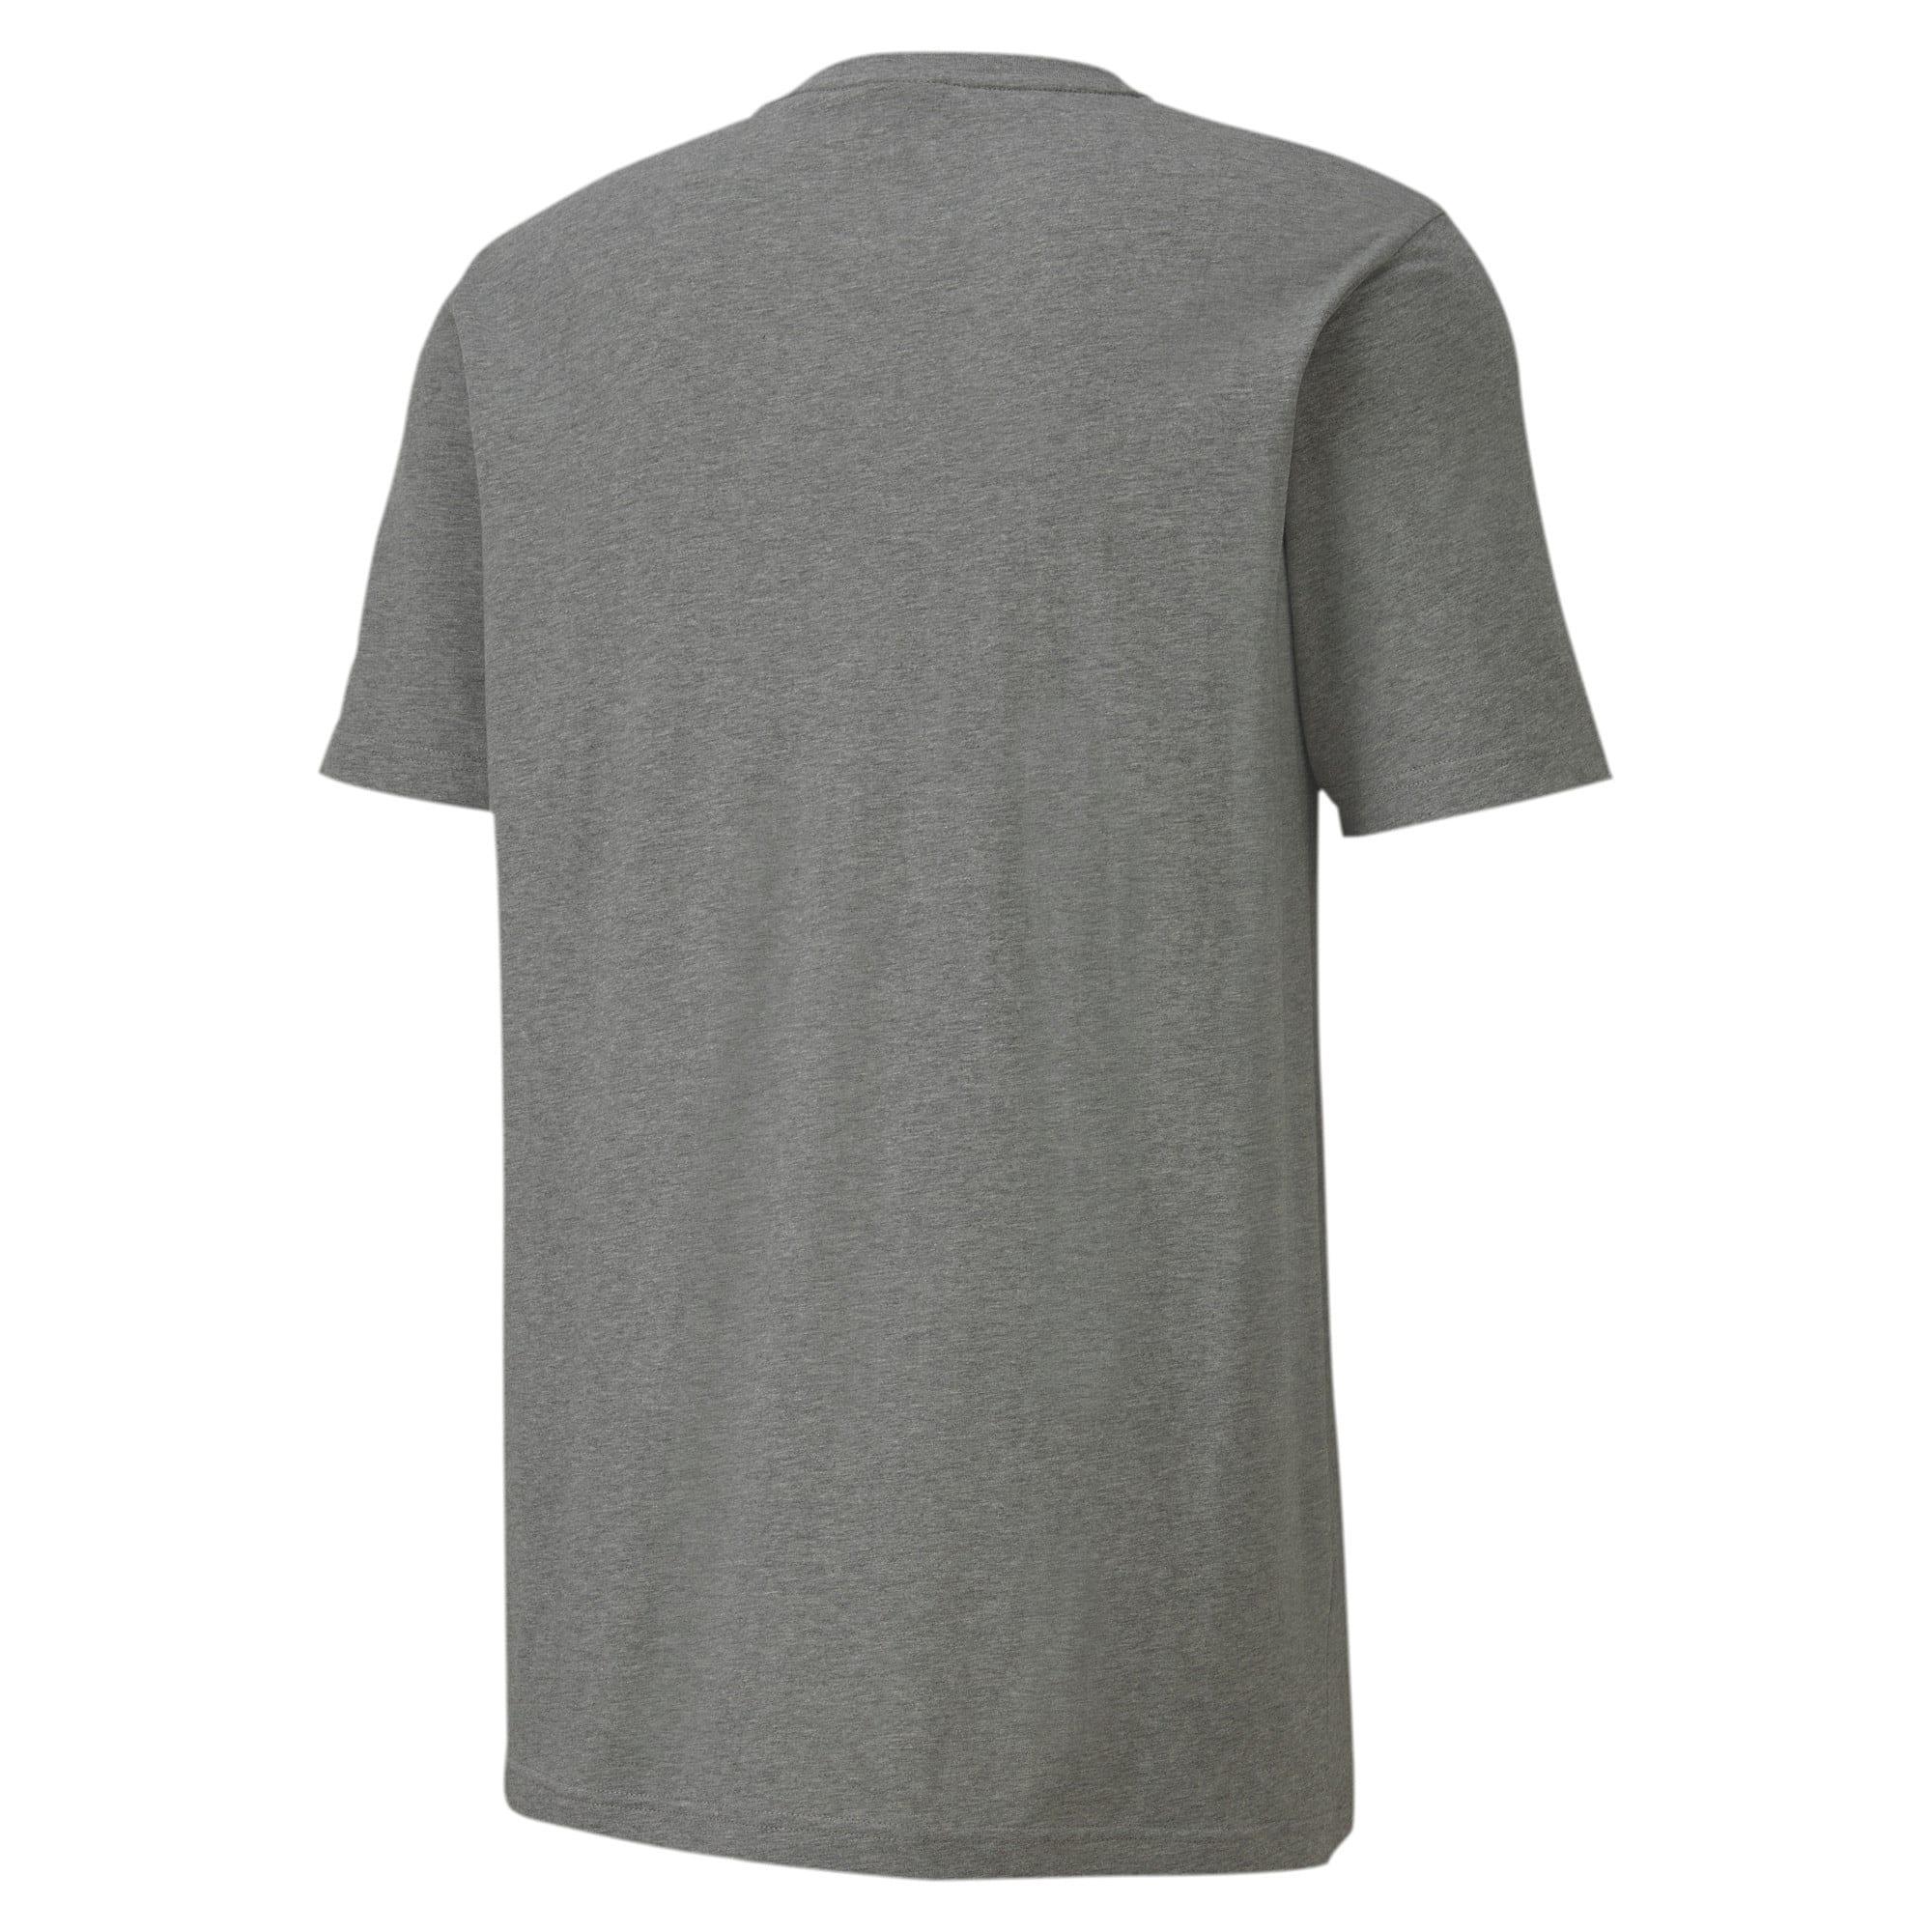 Thumbnail 6 of CLASSICS ロゴ SS Tシャツ 半袖, Medium Gray Heather, medium-JPN